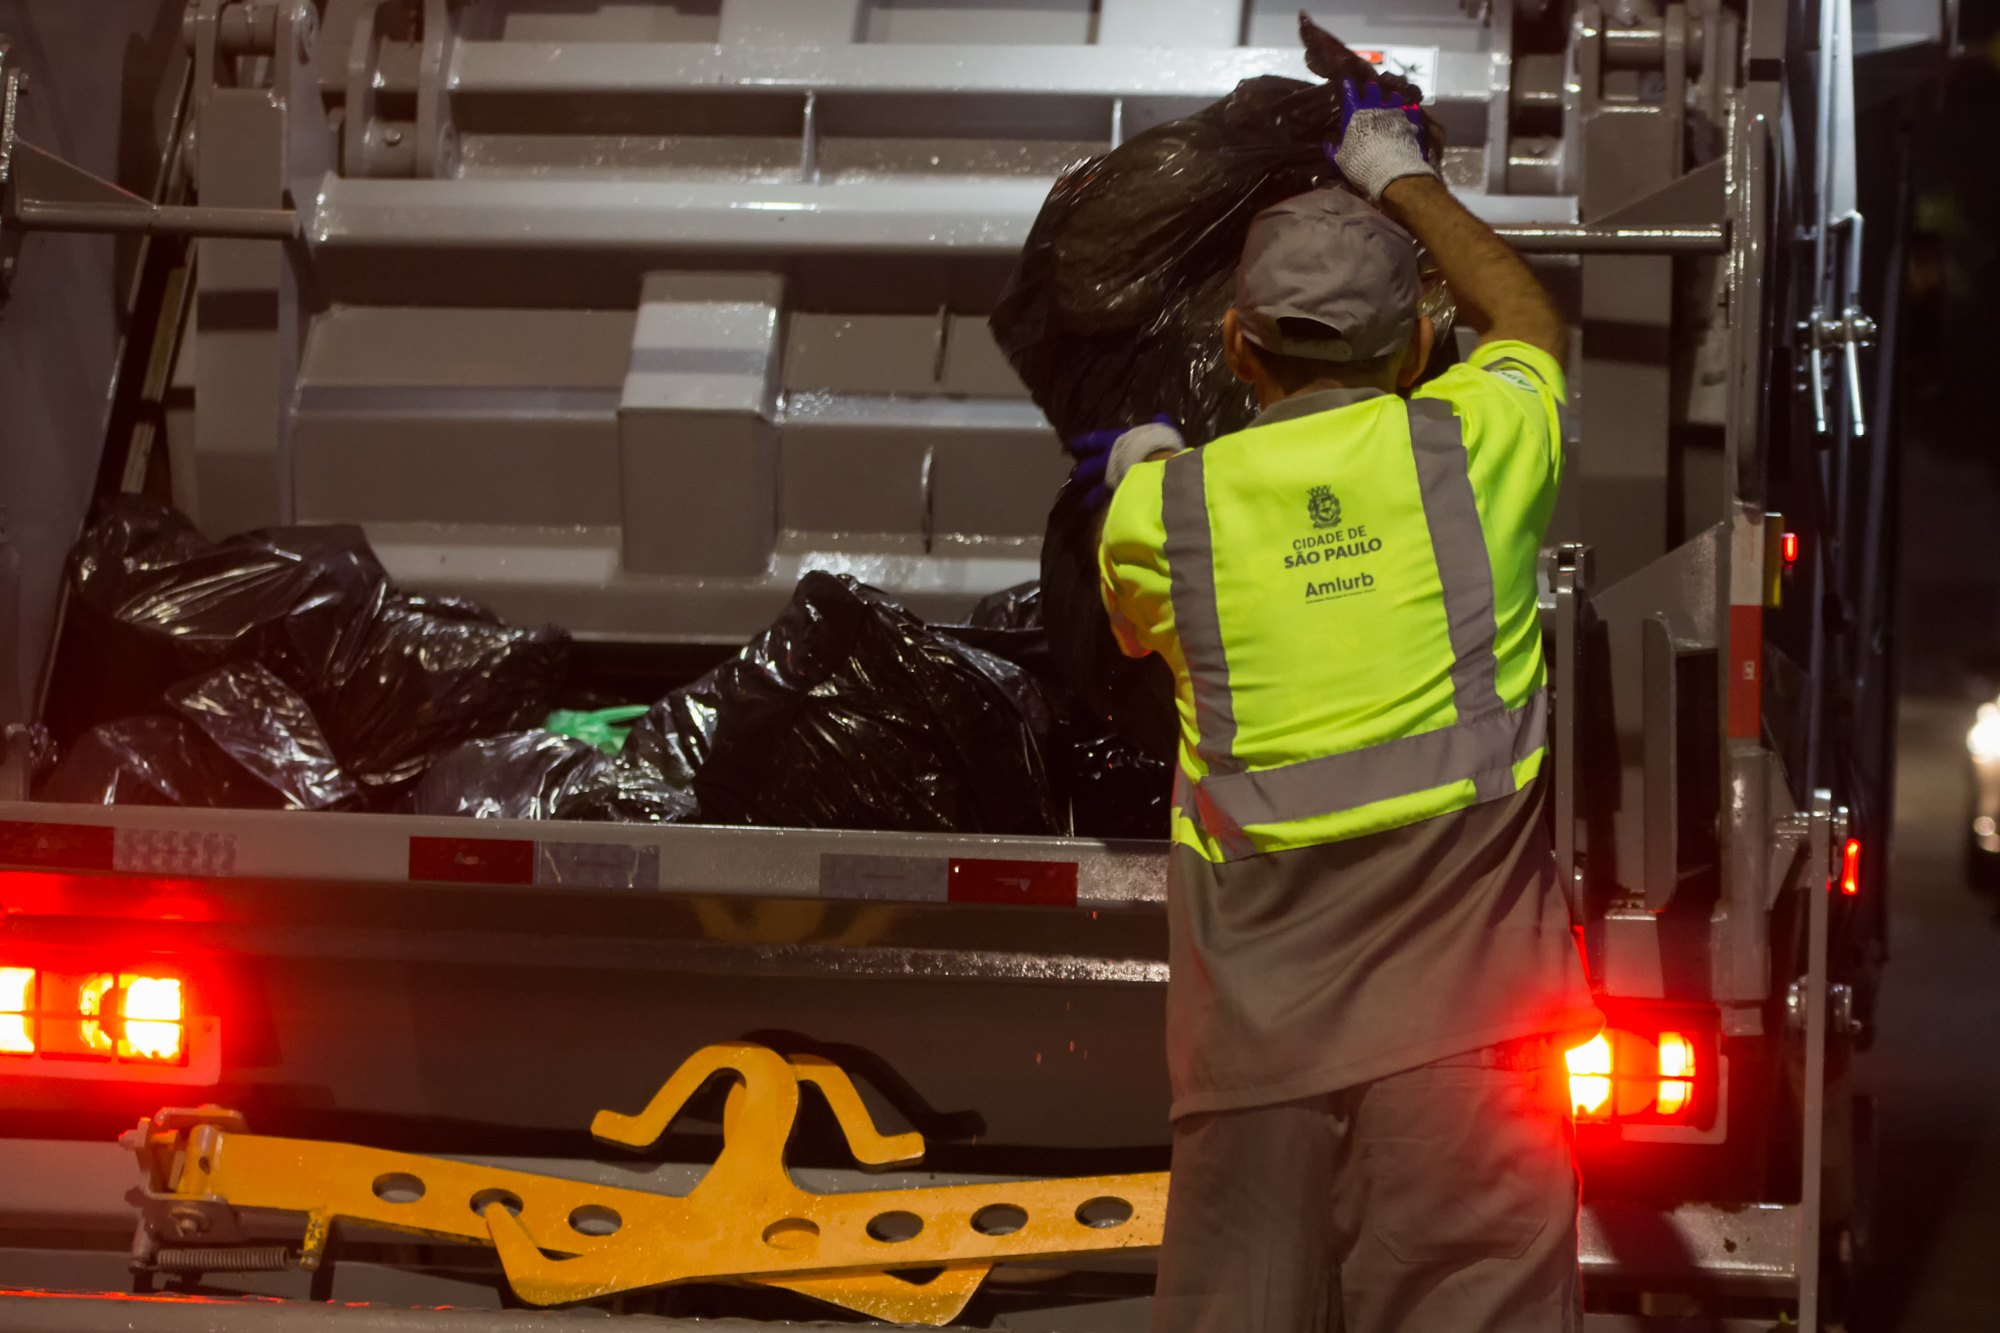 coletores de lixo- 2626 -4